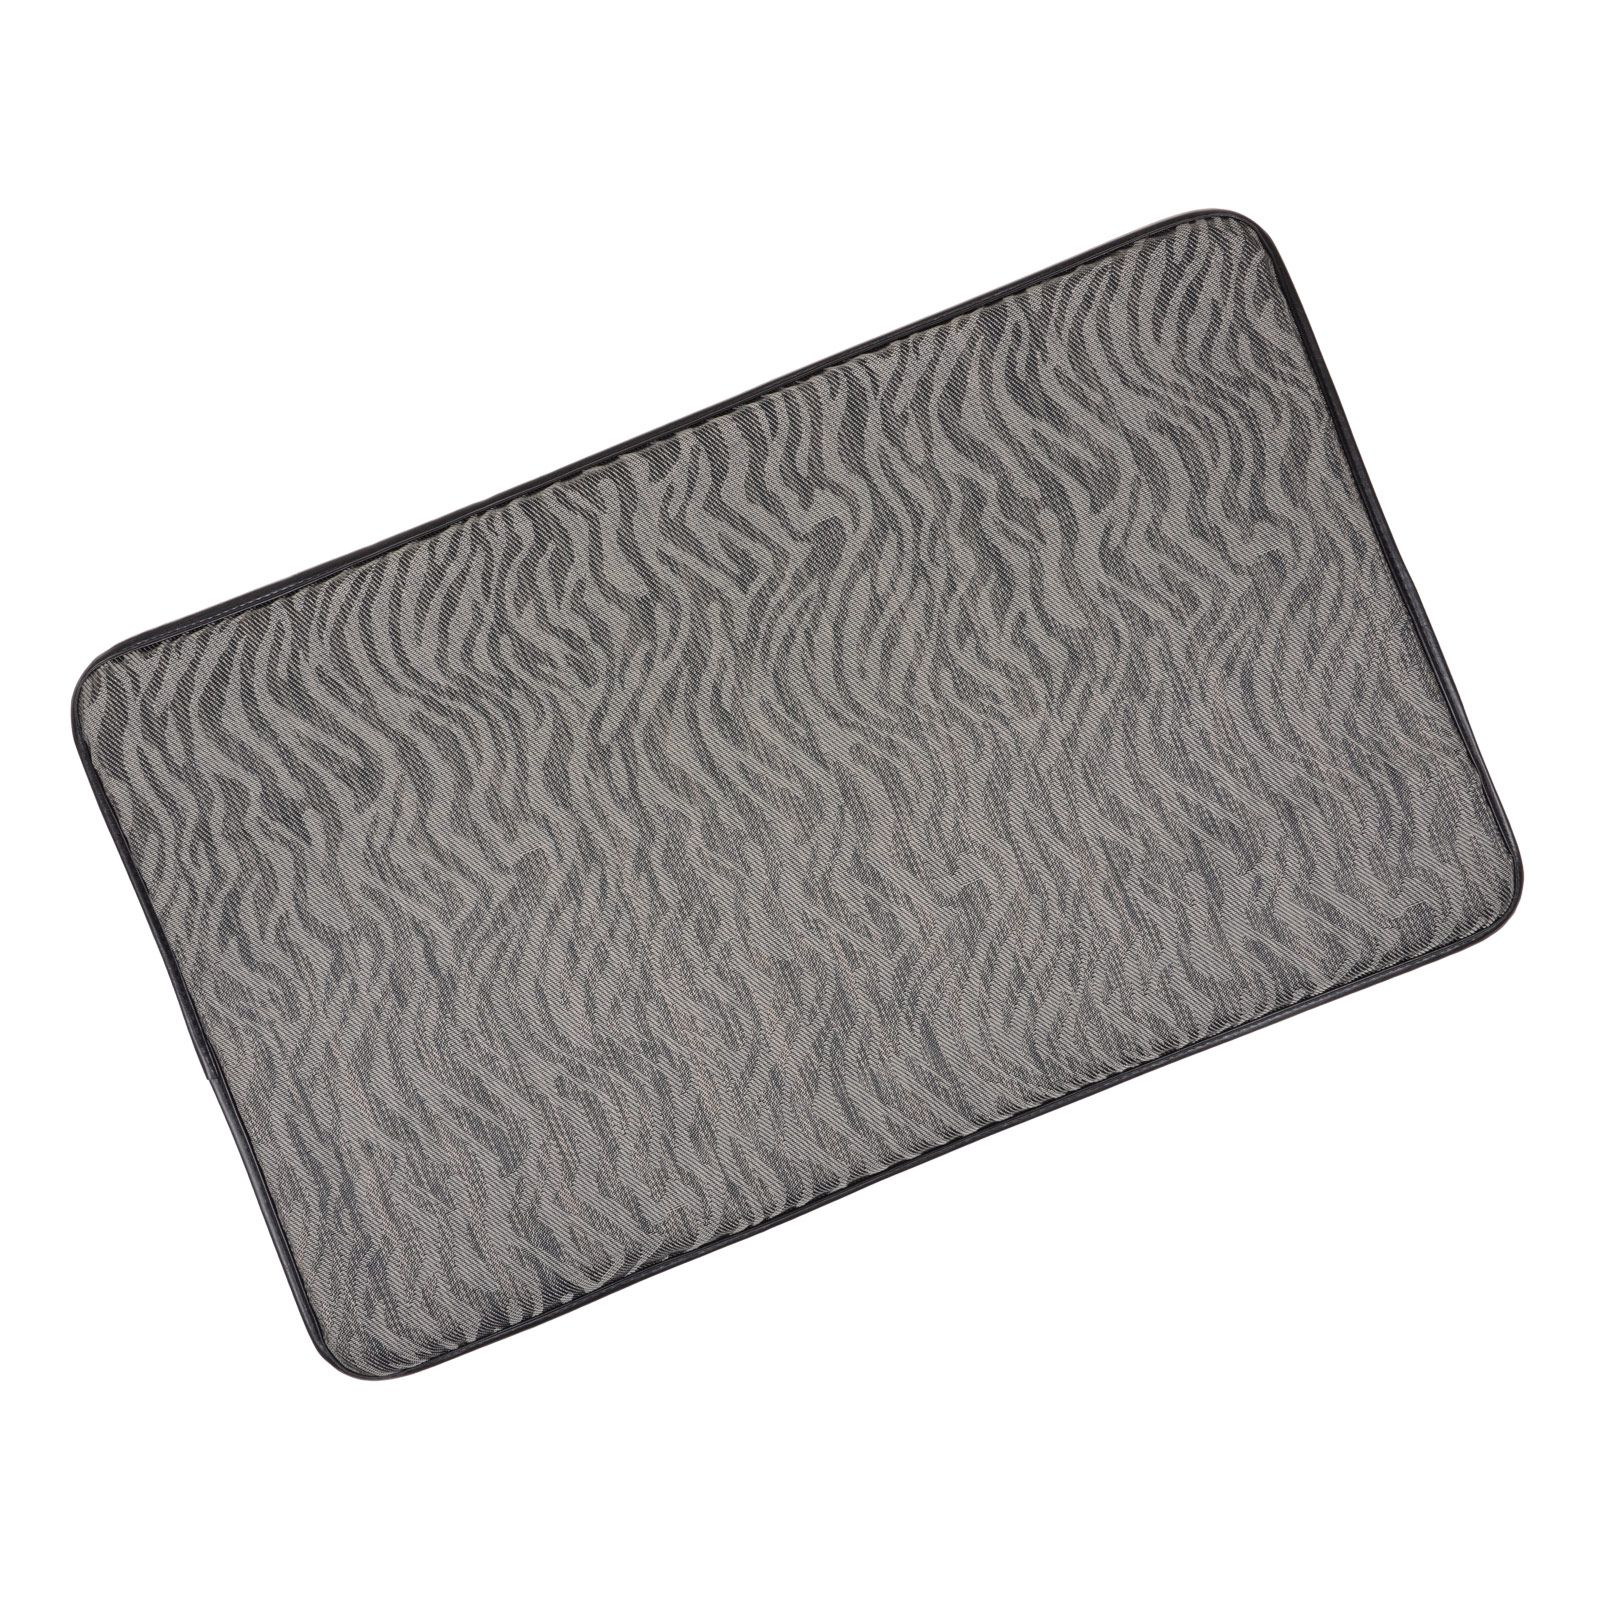 kitchen memory foam mat origami folding island cart anti fatigue stress comfort home